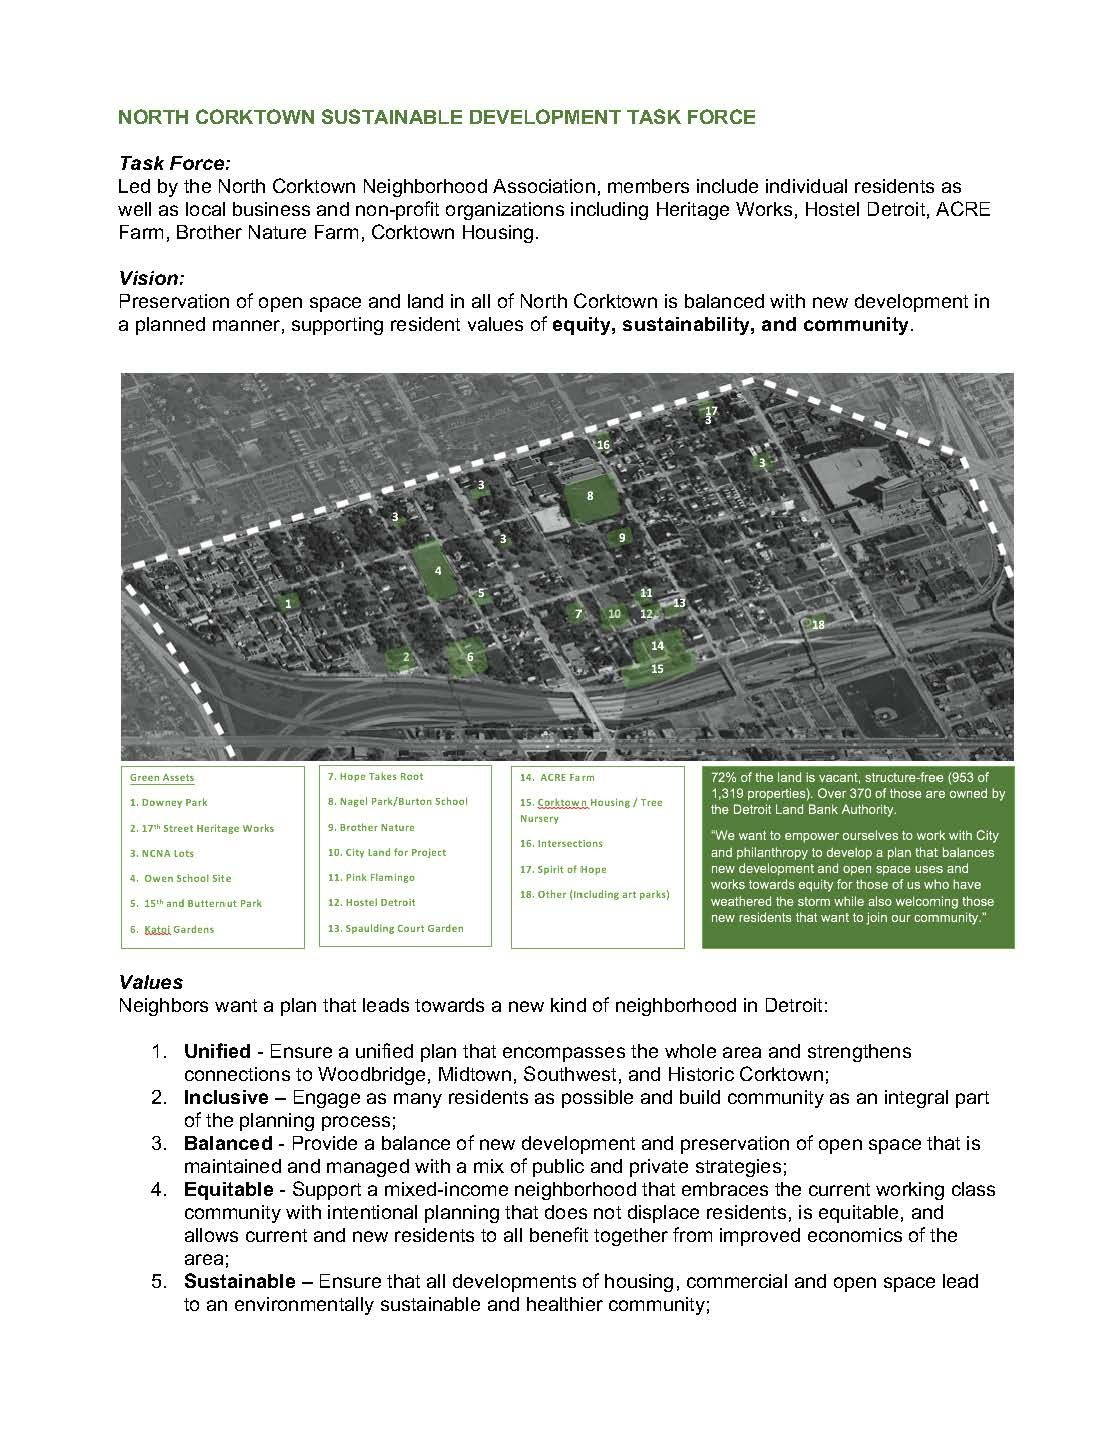 Initial NoCo Taskforce Plan